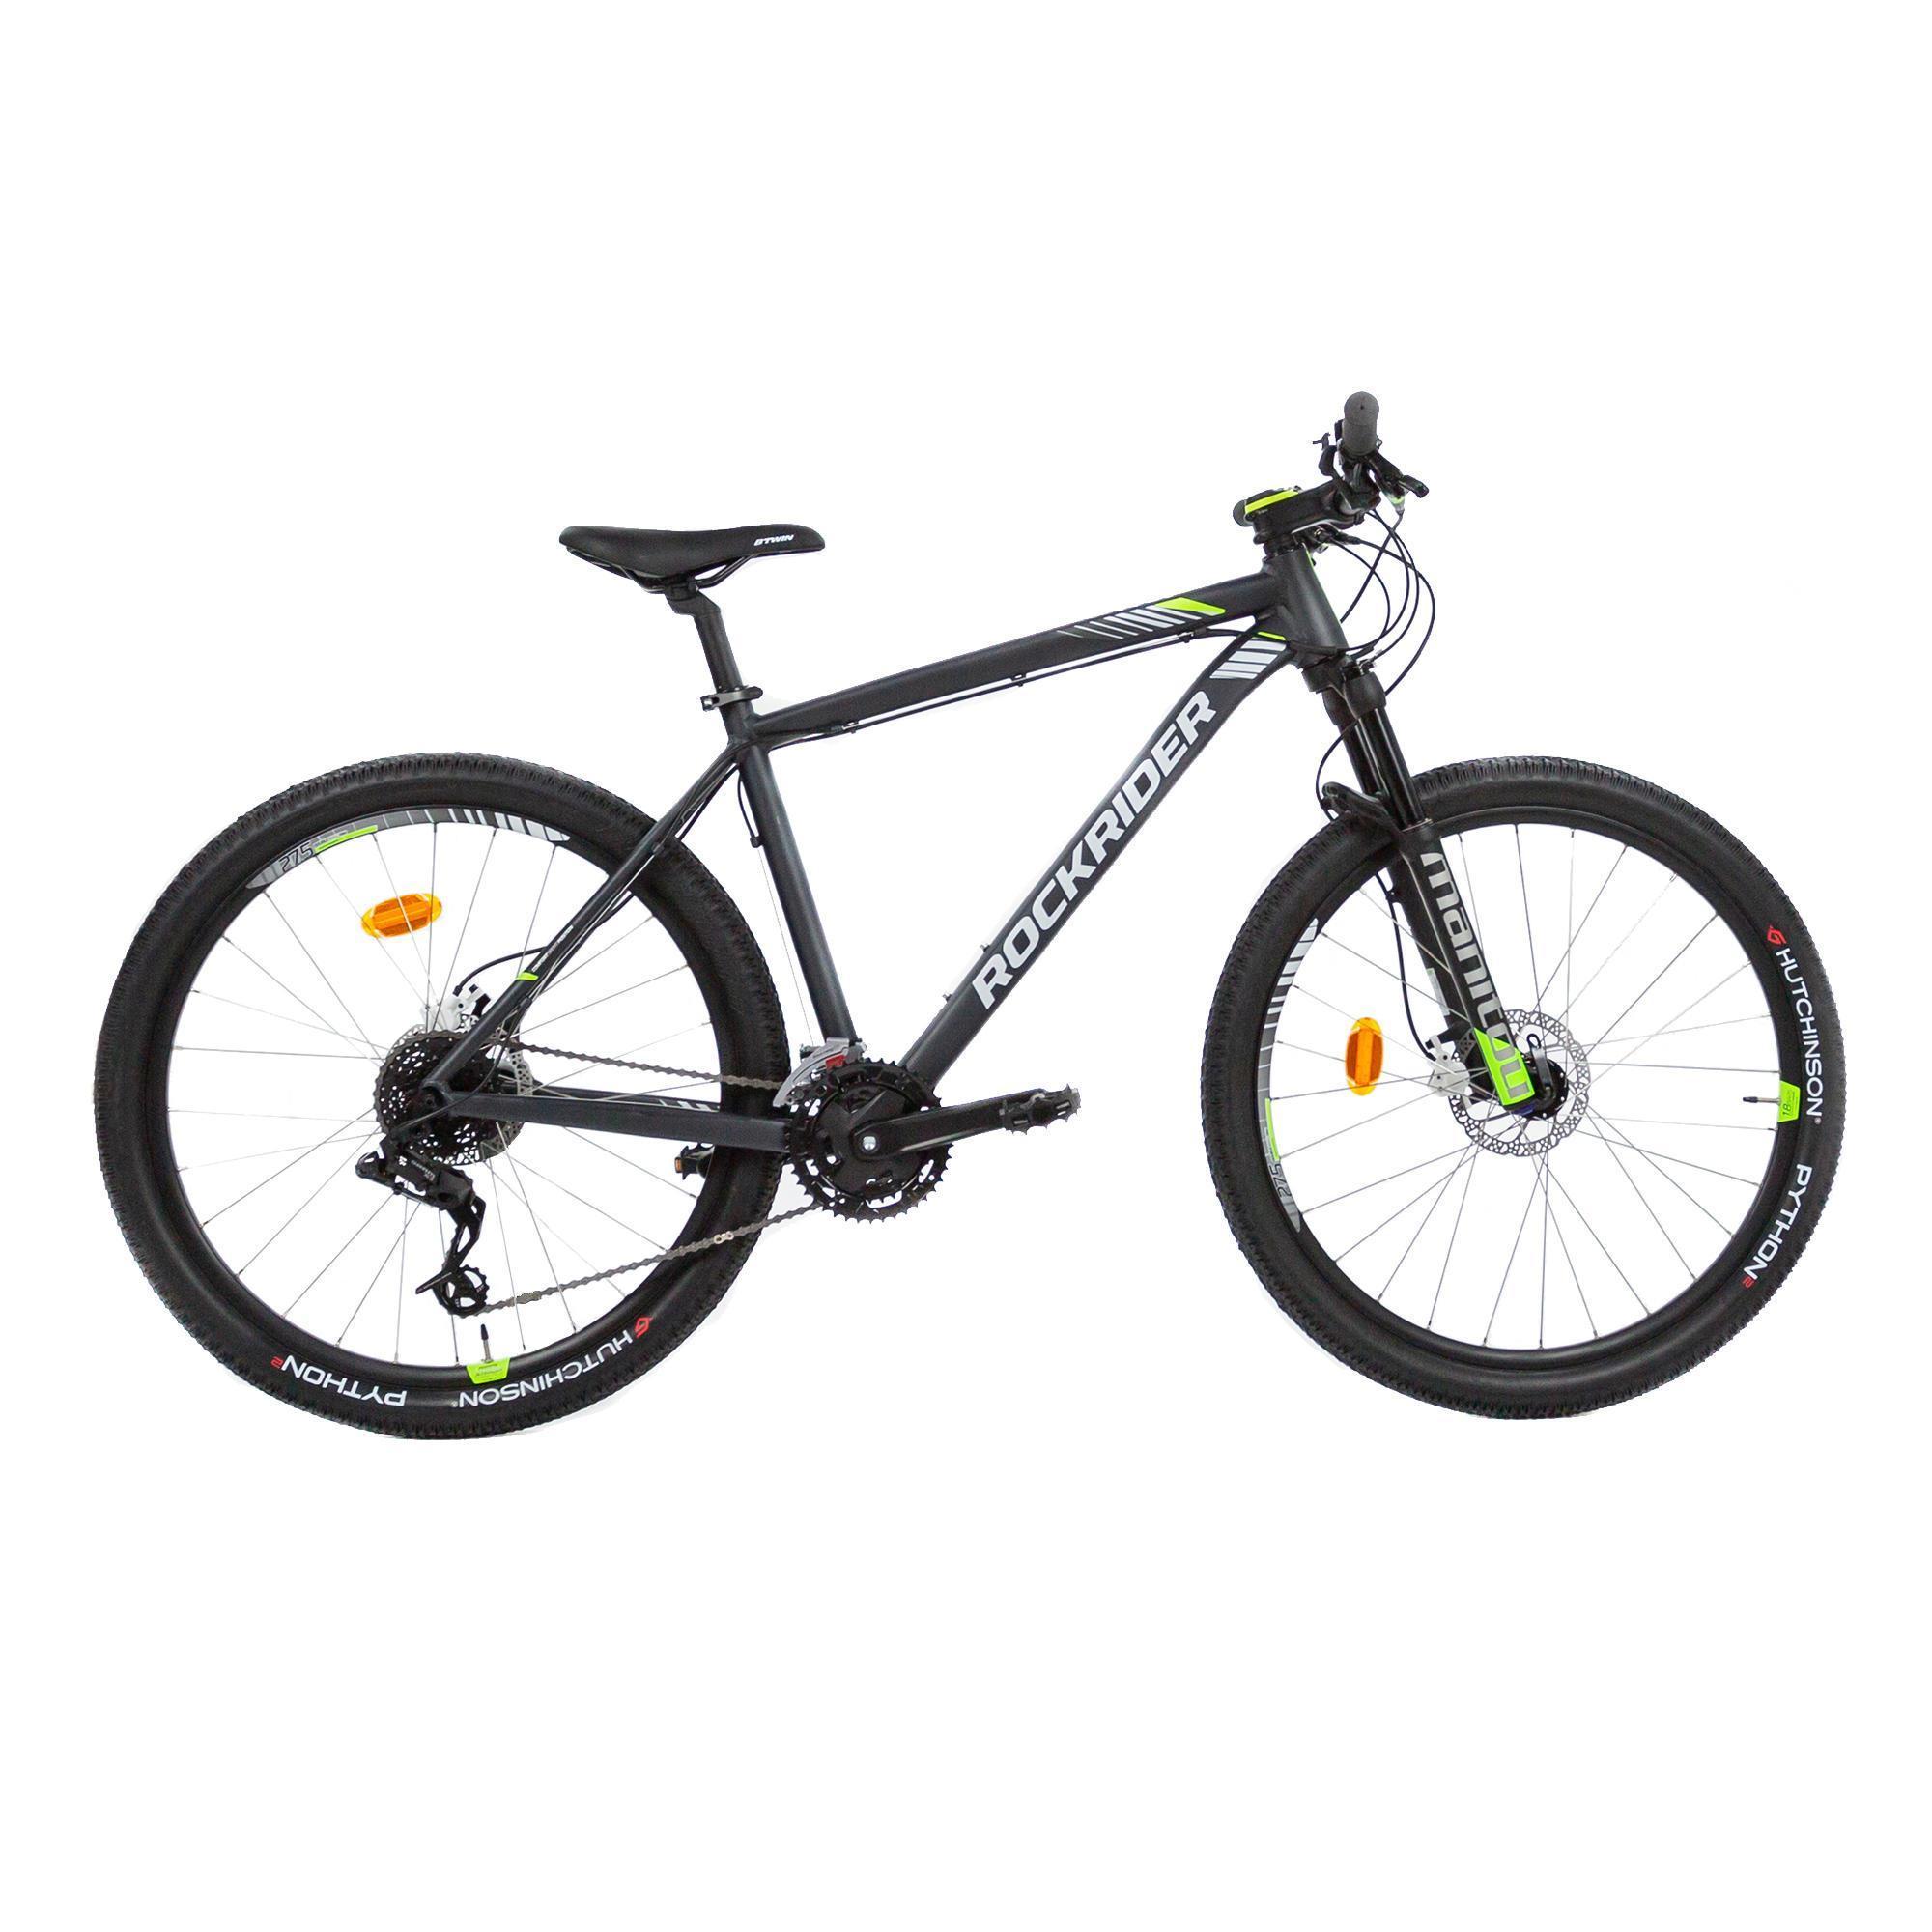 Bicicleta De Montana Rockrider 530 Ltd 27 5 Negro Amarillo